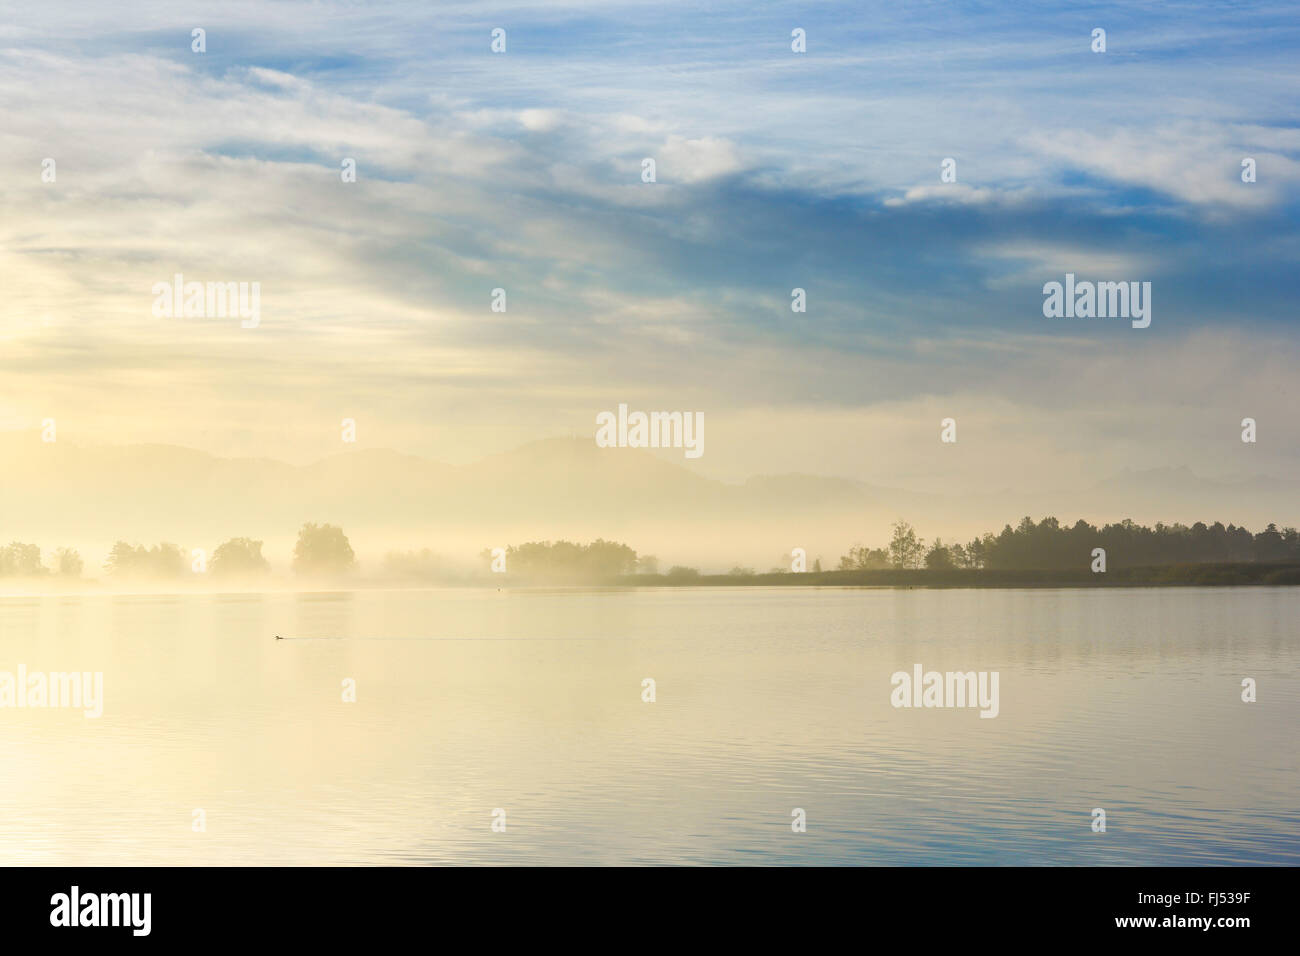 Lake Pfaeffikon in morning mood, Switzerland, Zuercher Oberland - Stock Image